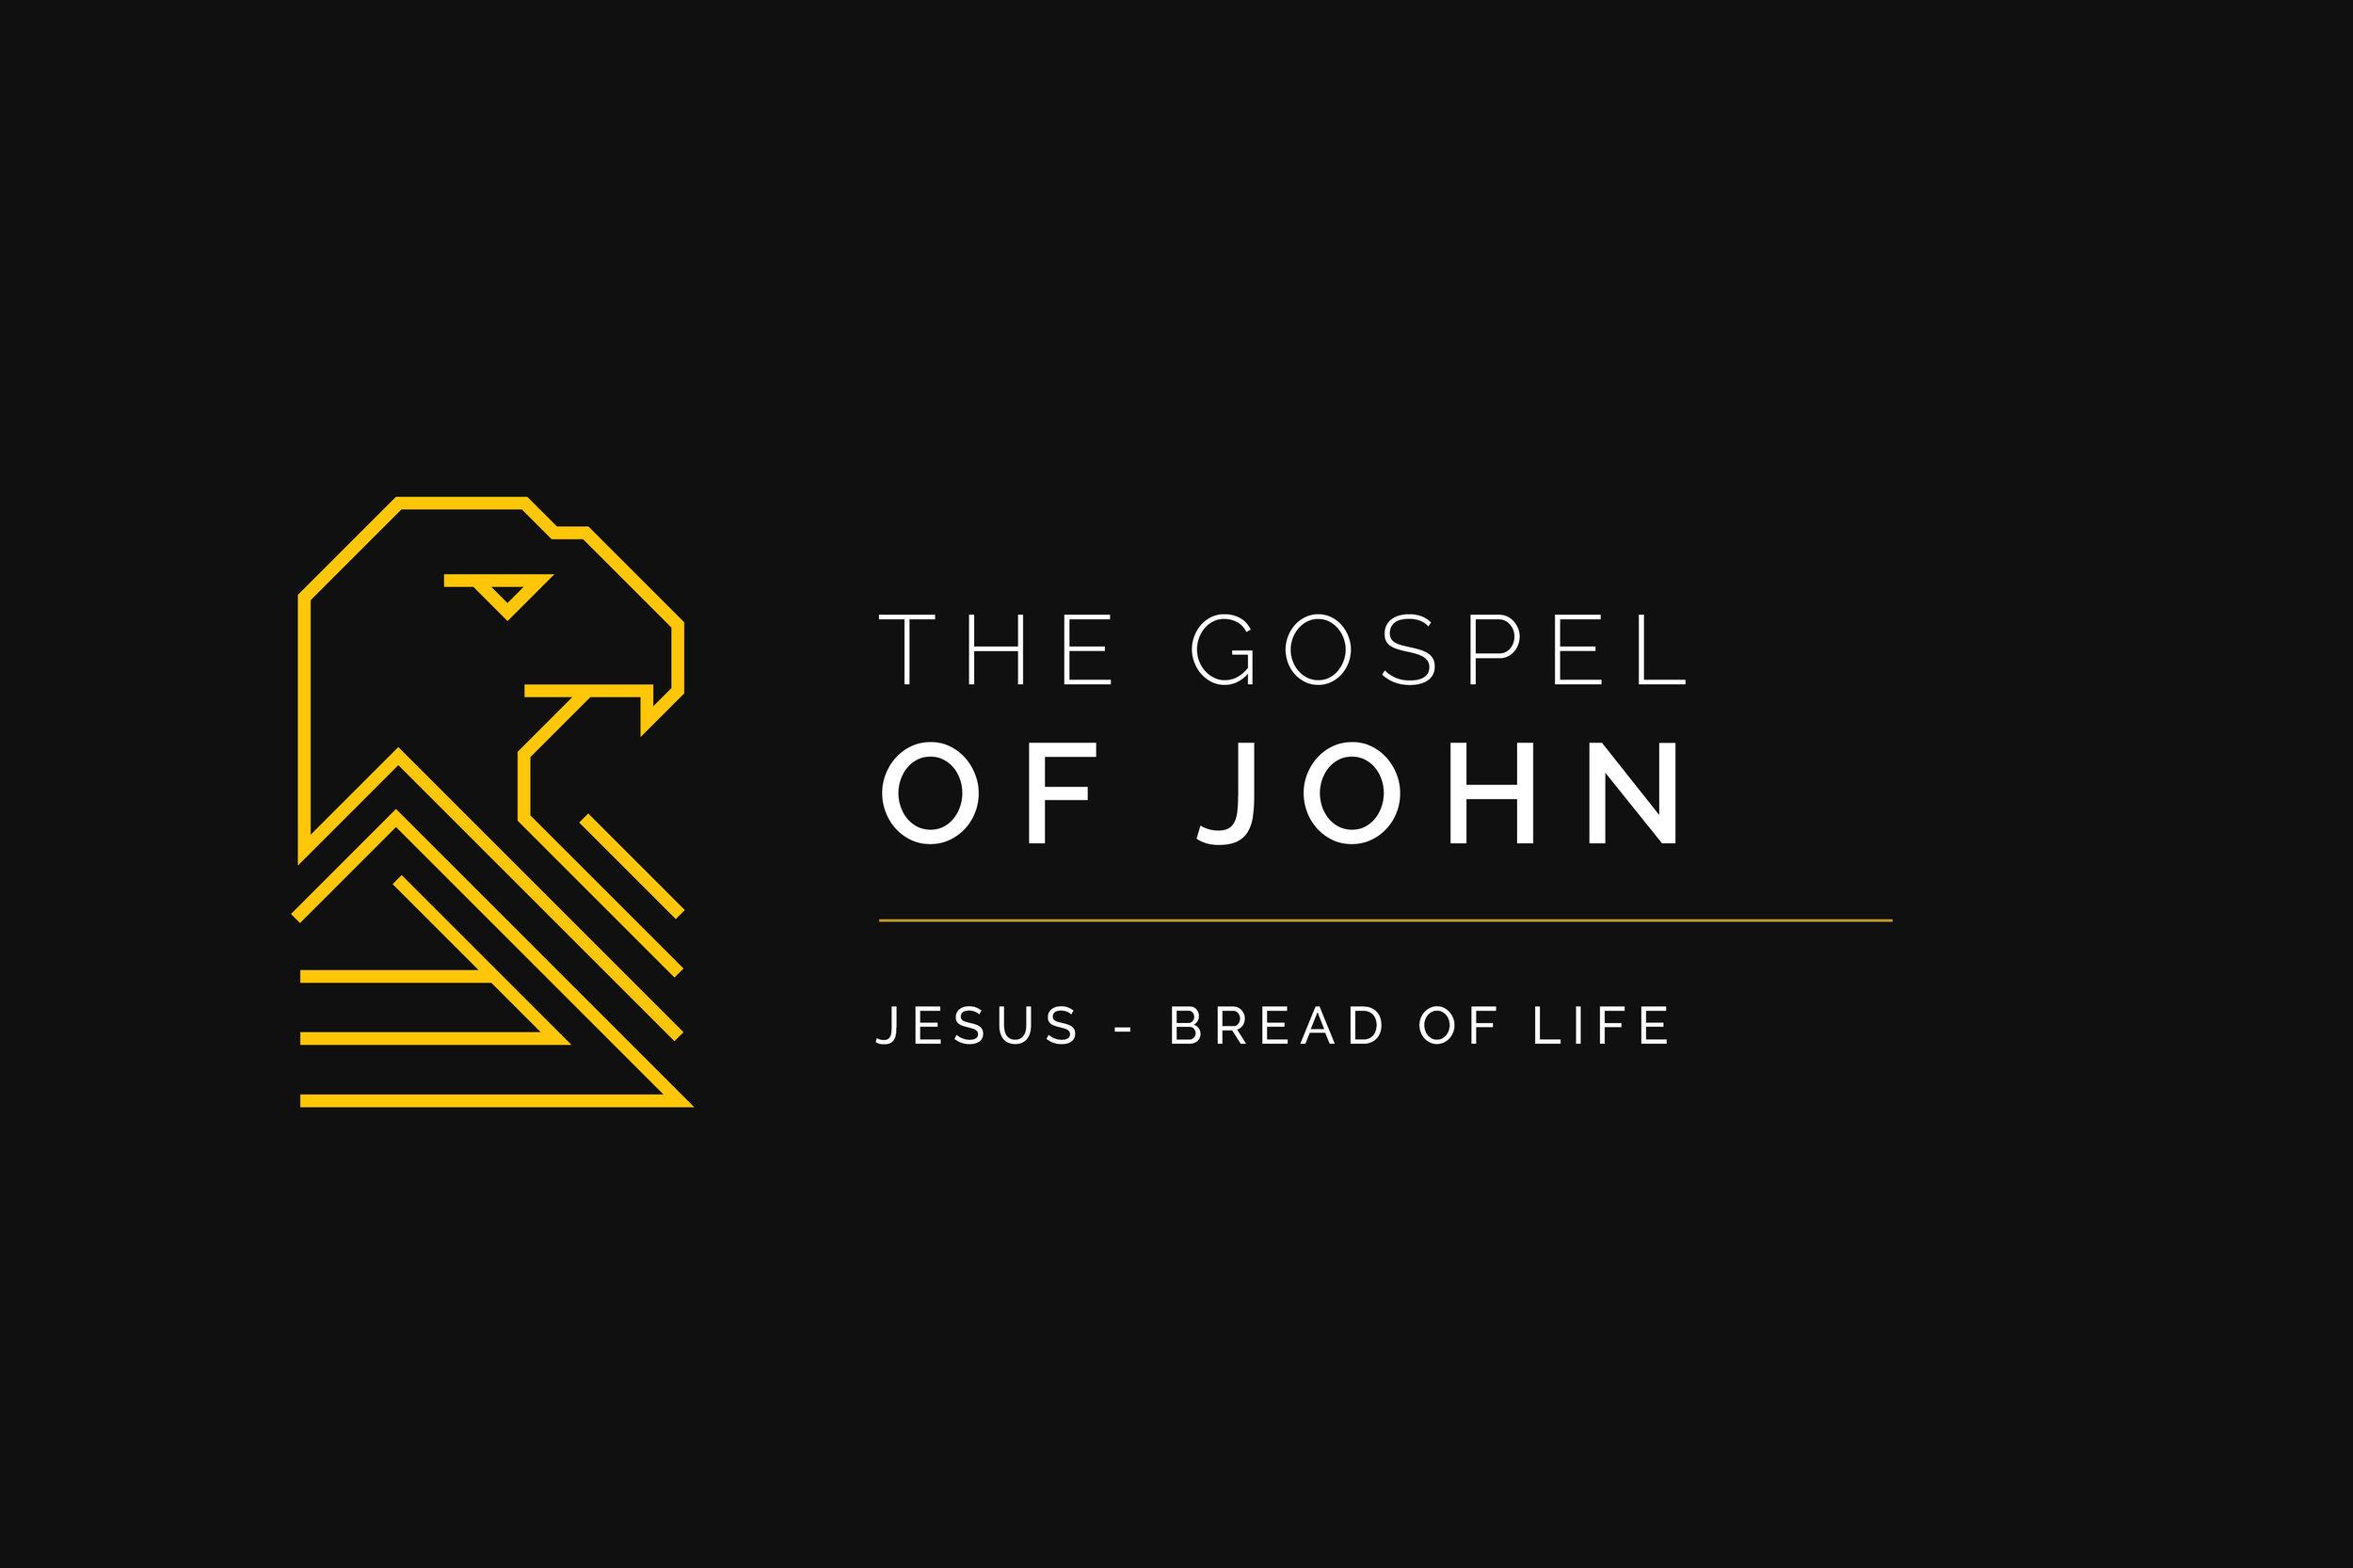 The-Gospel-of-John-BreadOfLife.jpg